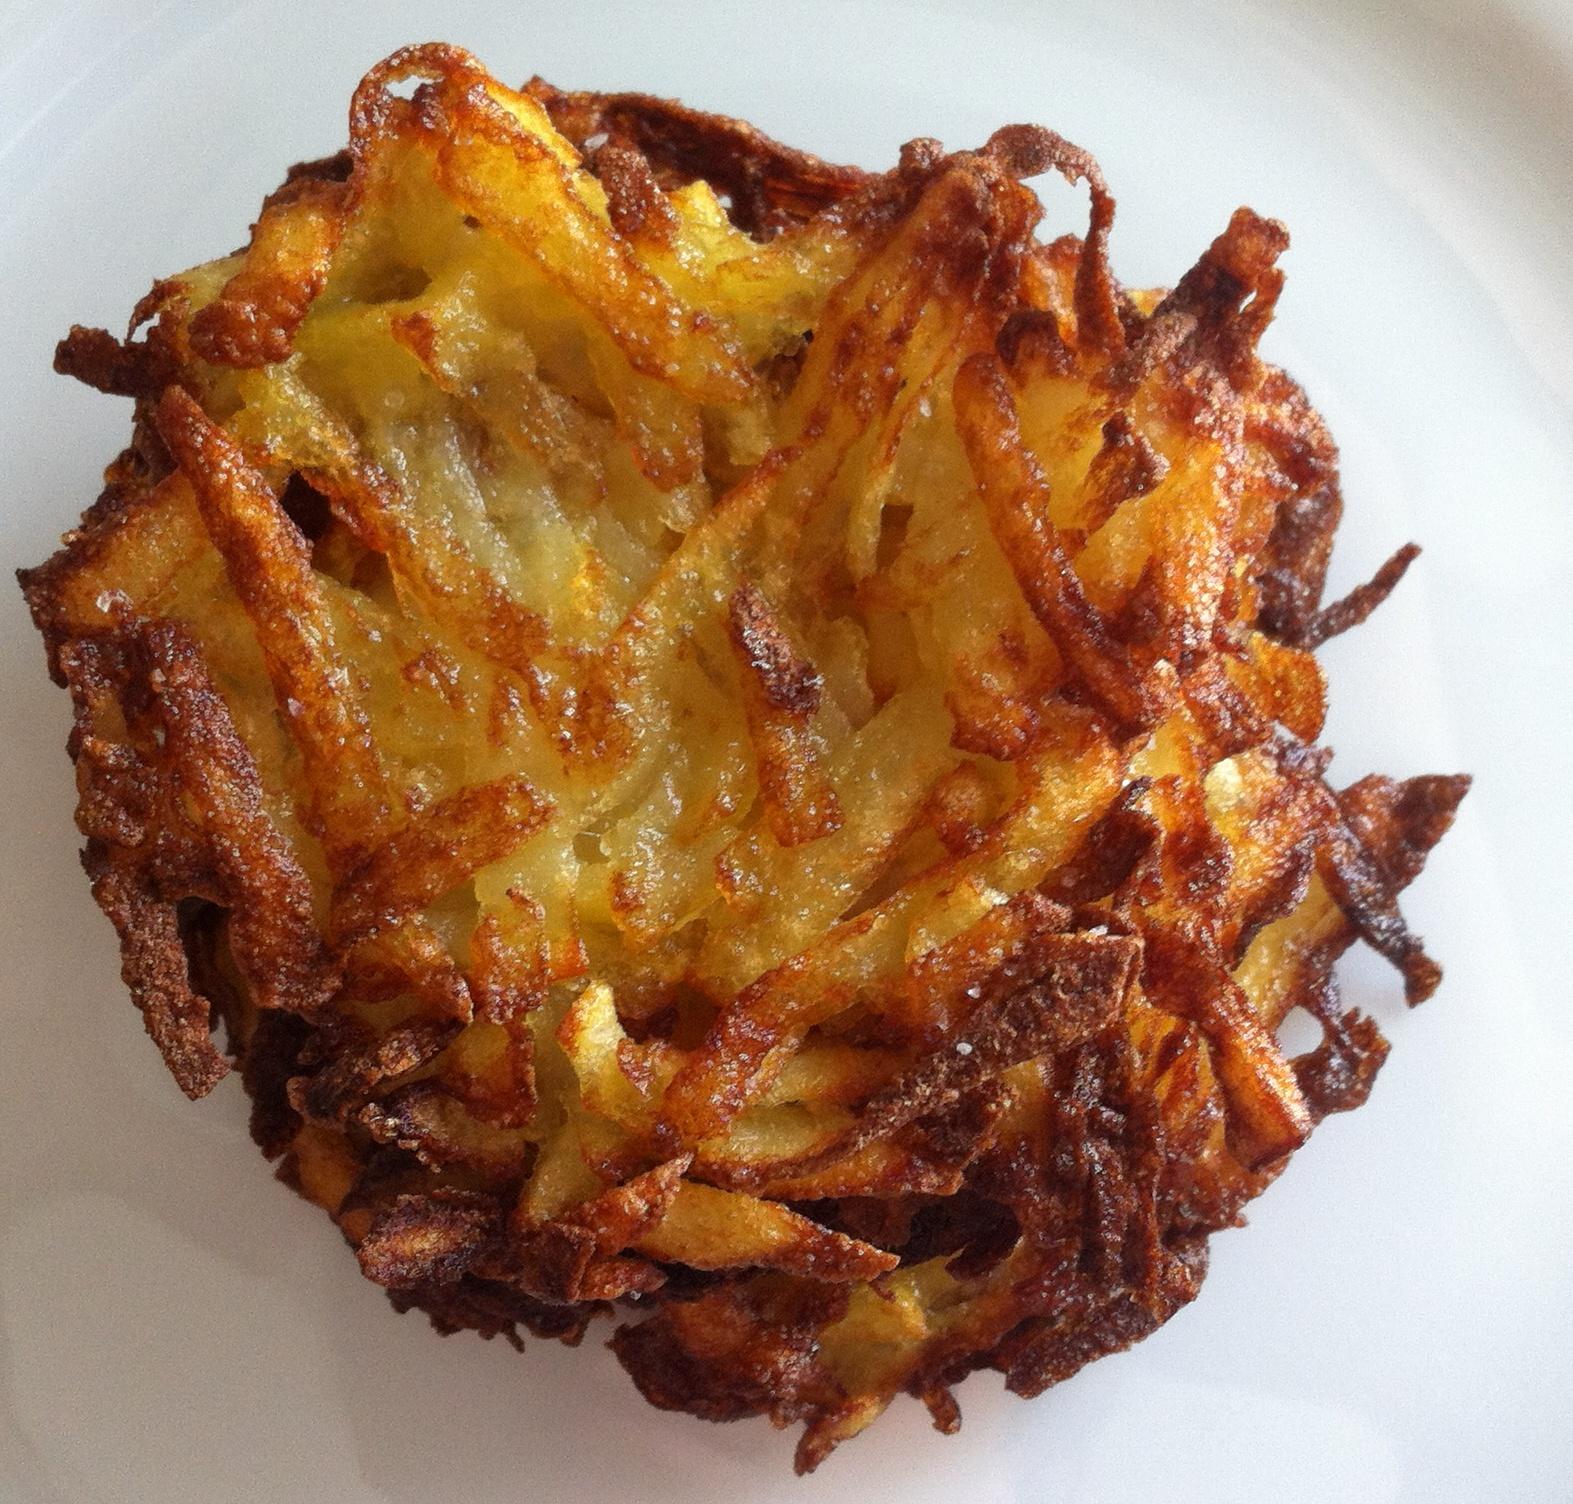 rösti di patate | antipastiveloci.it - Cosa Cucinare Oggi A Pranzo